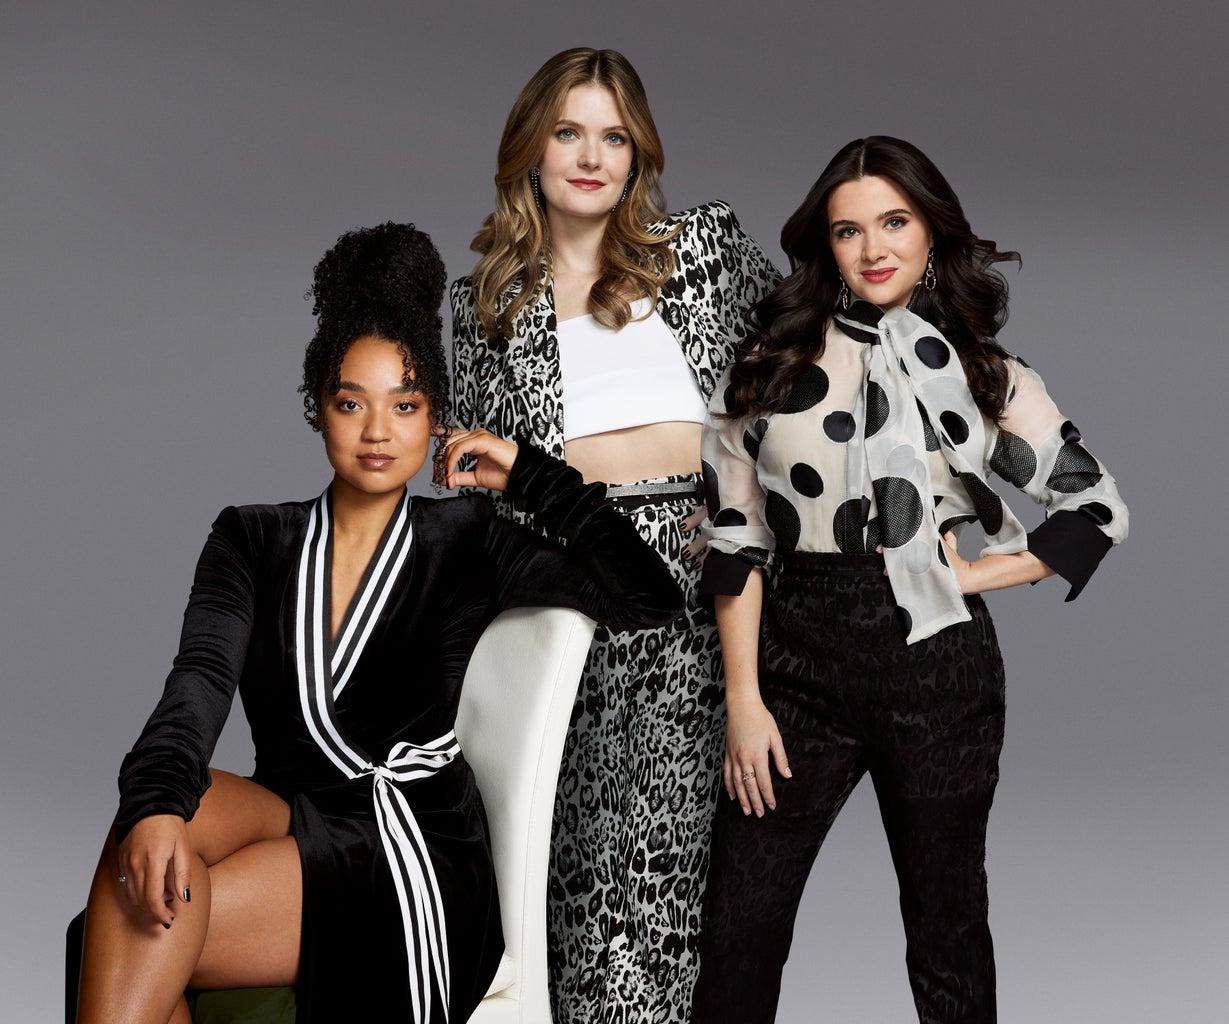 The Bold Type stars Aisha Dee as Kat Edison, Meghann Fahy as Sutton Brady and Katie Stevens as Jane Sloan.